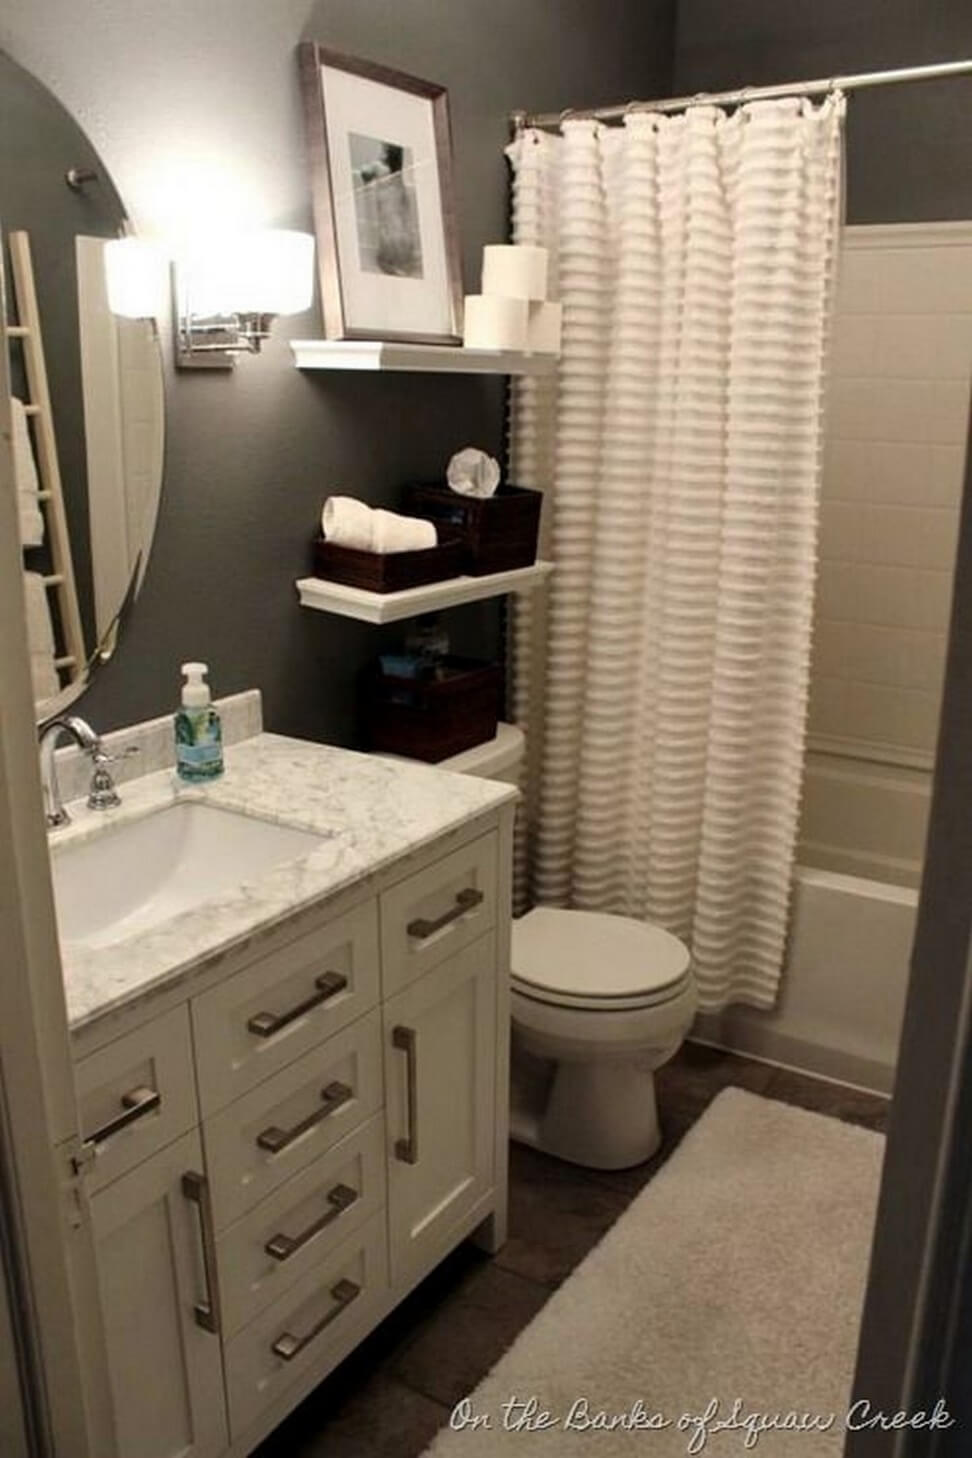 32 Best Small Bathroom Design Ideas and Decorations for 2017 on Small Bathroom Ideas id=88652